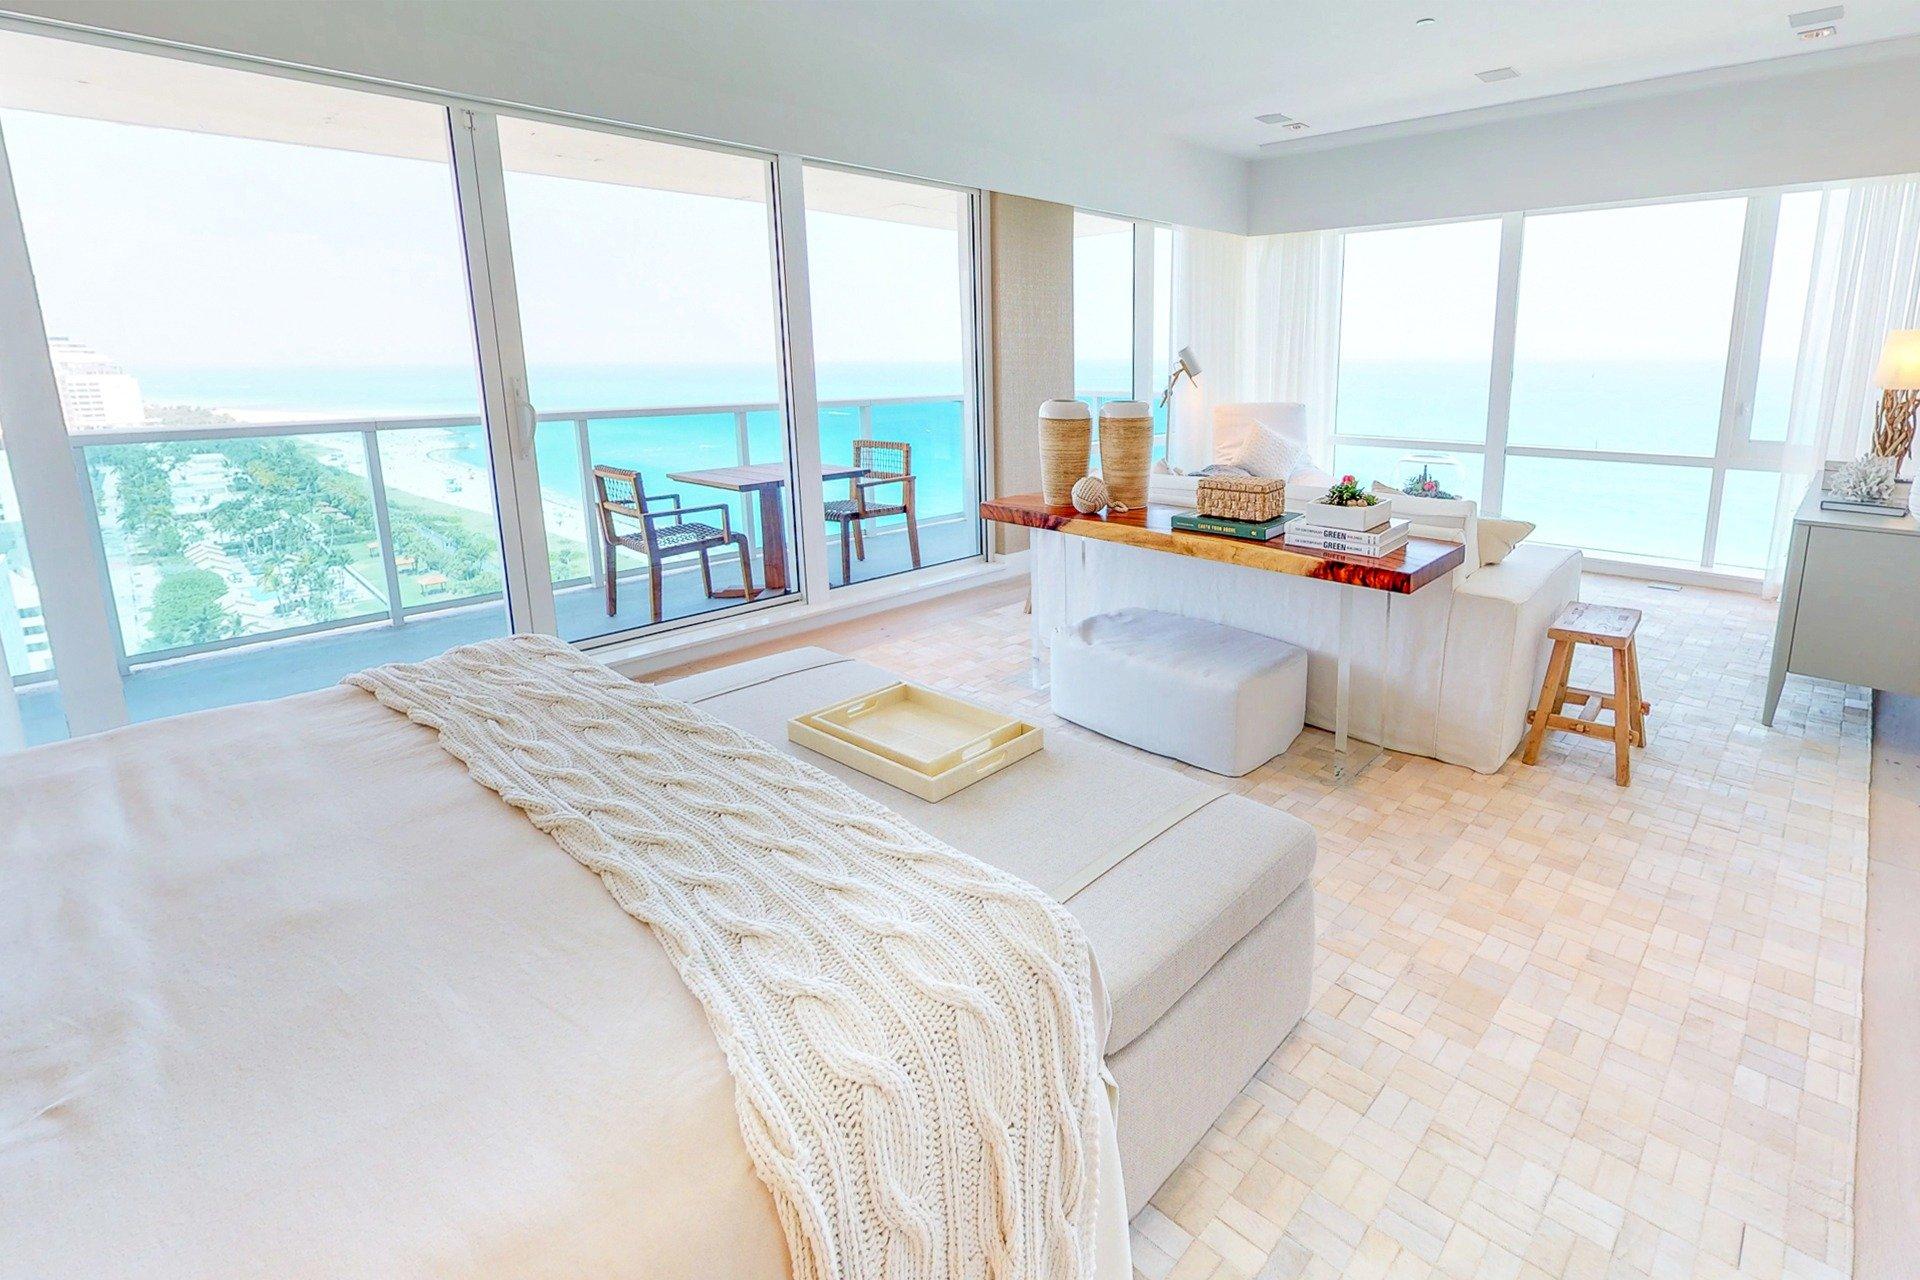 Miami Condo Virtual Tour